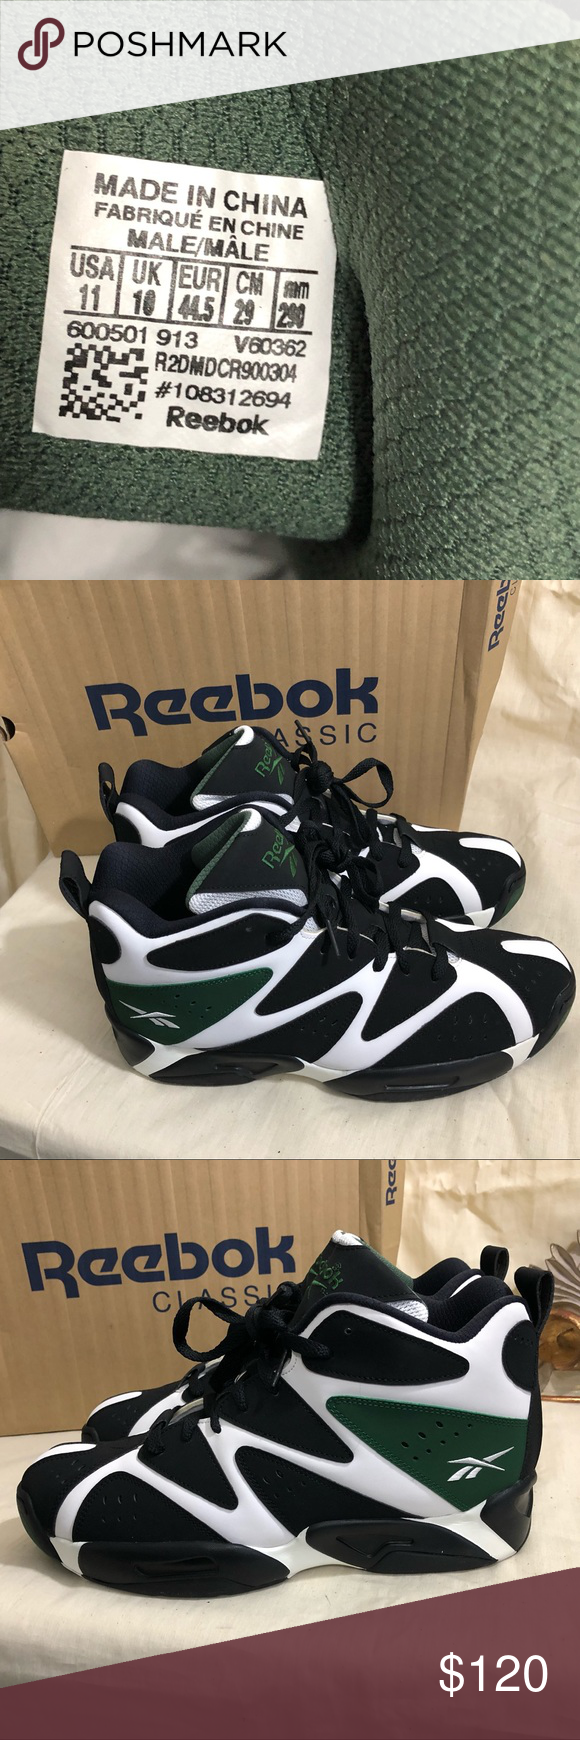 promo code 27f48 0b3f4 REEBOK KAMIKAZE I MID SEATTLE SUPERSONICS Pre owned Men's Reebok Kamikaze I MID  Seattle SuperSonics colors in like new condition and in original box size  11 ...